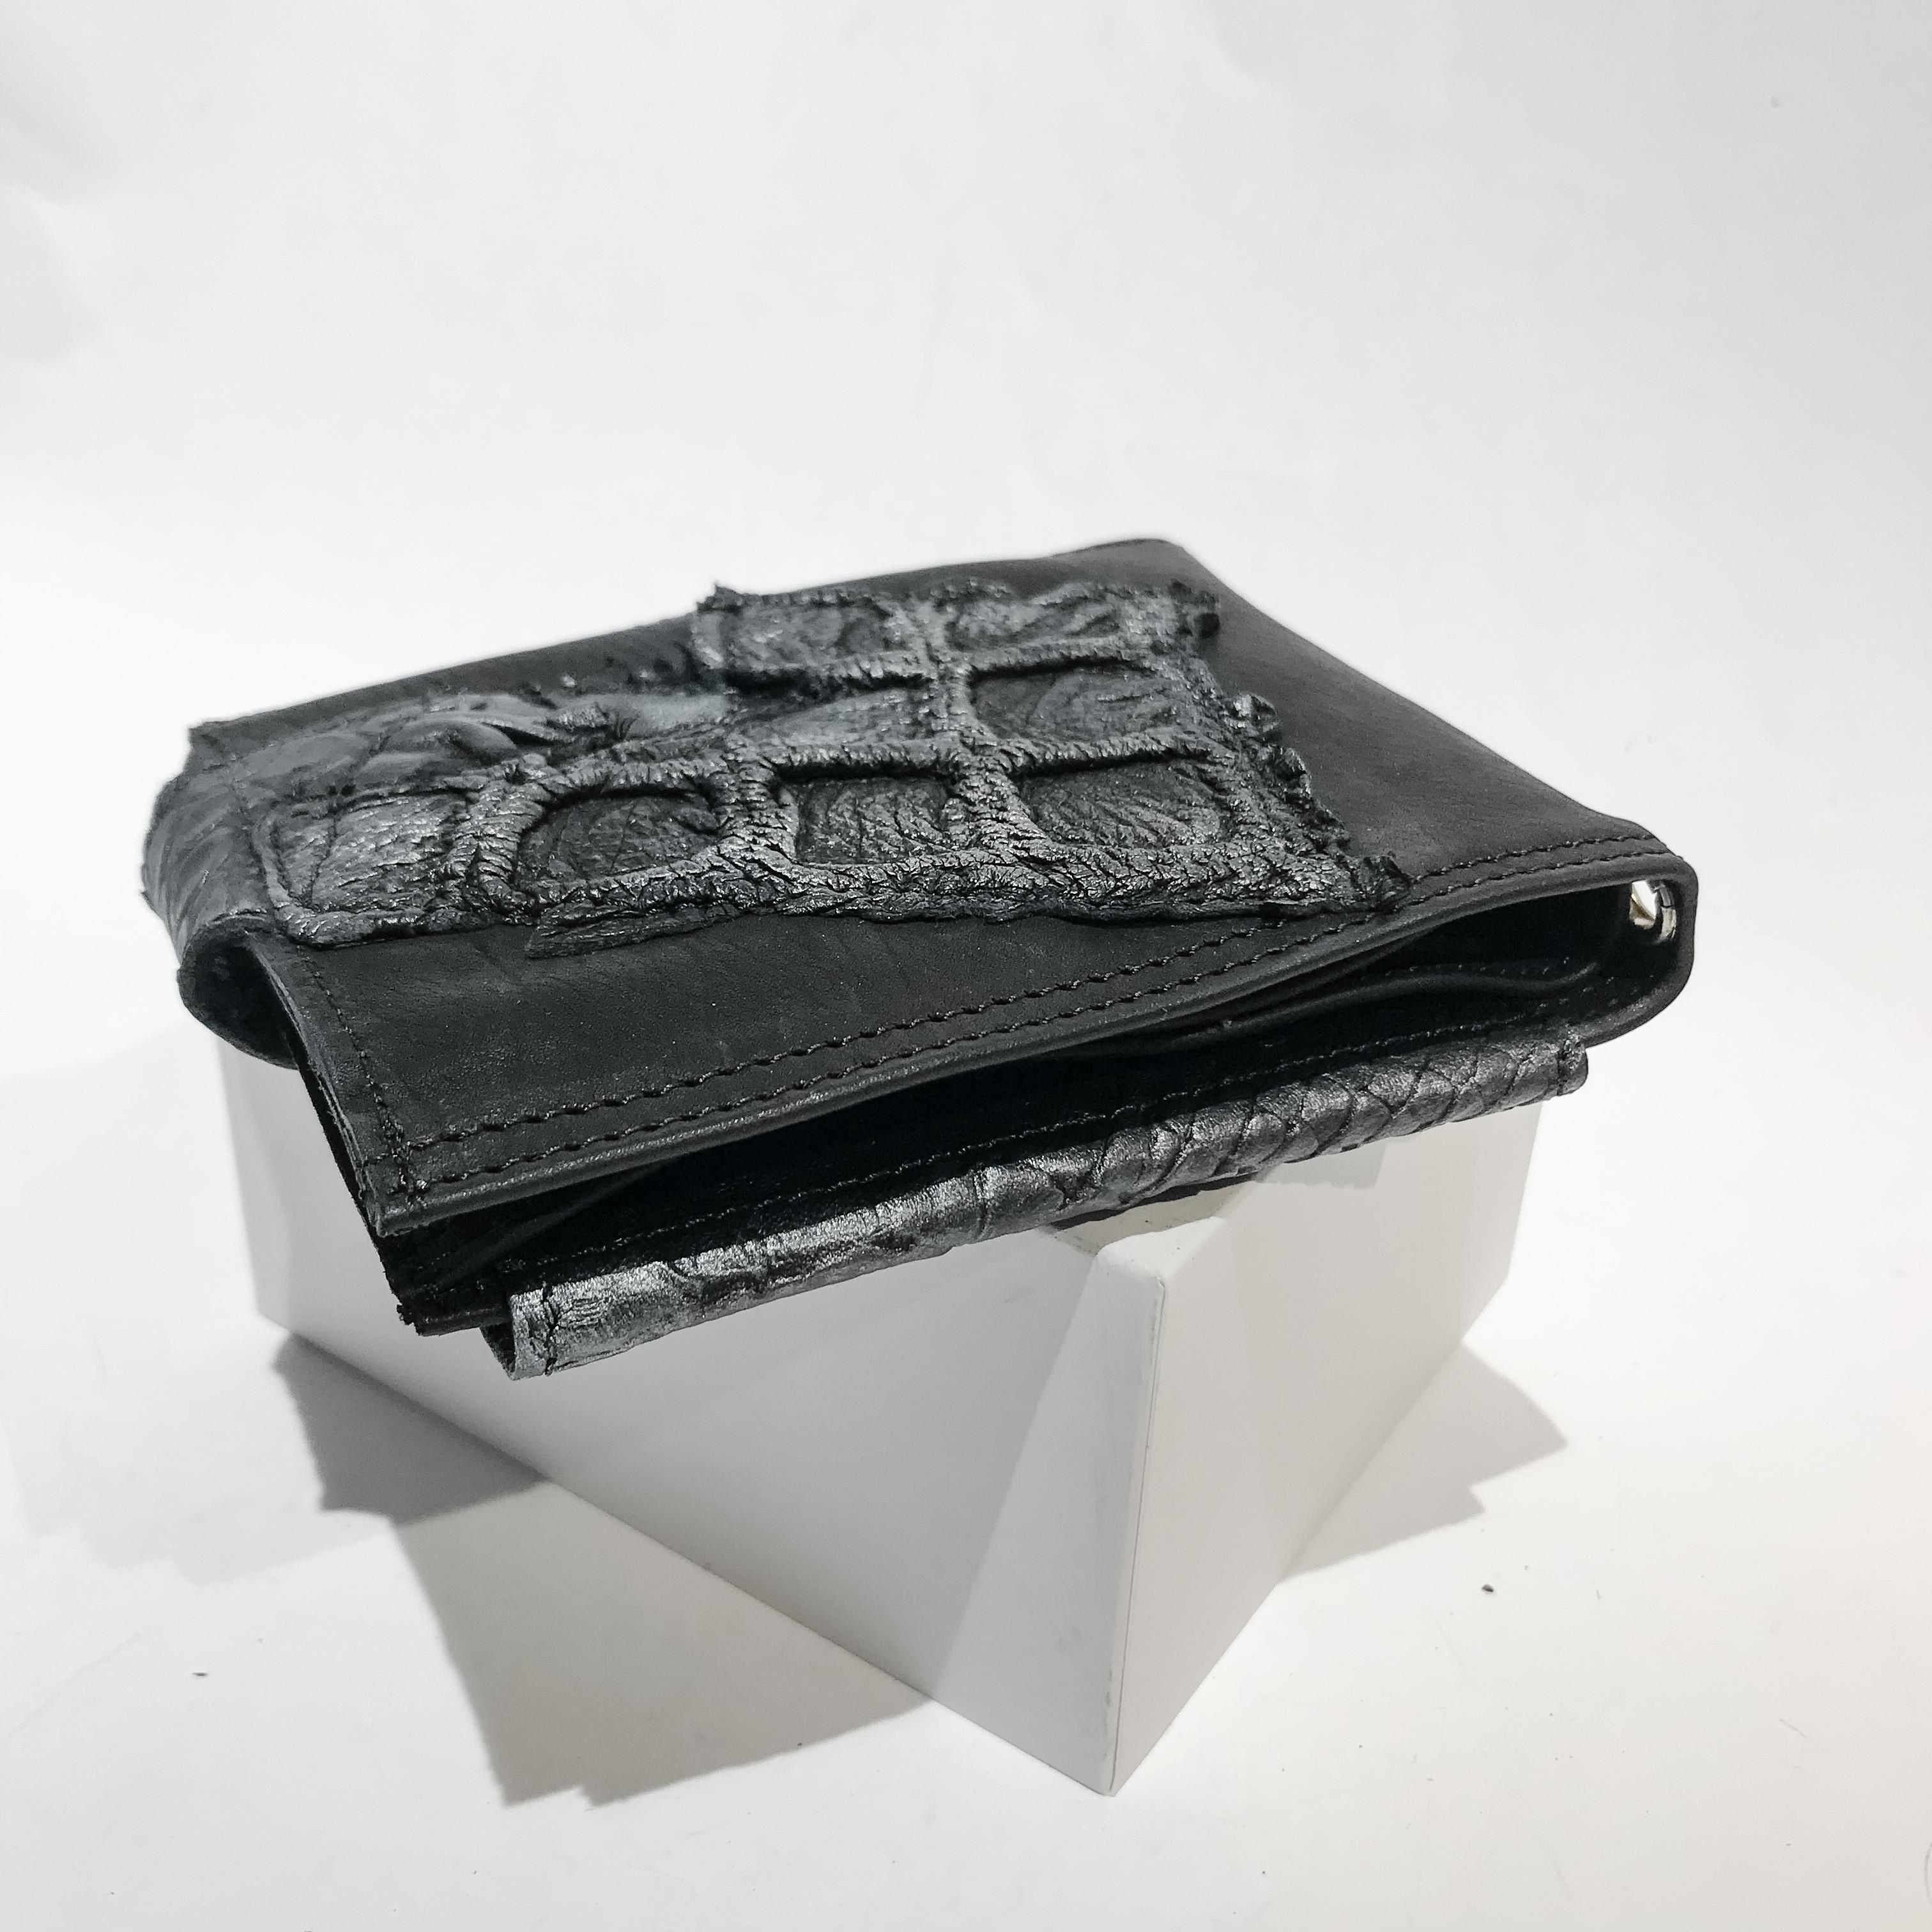 Blackstar Class Leather Wallet EvilEve